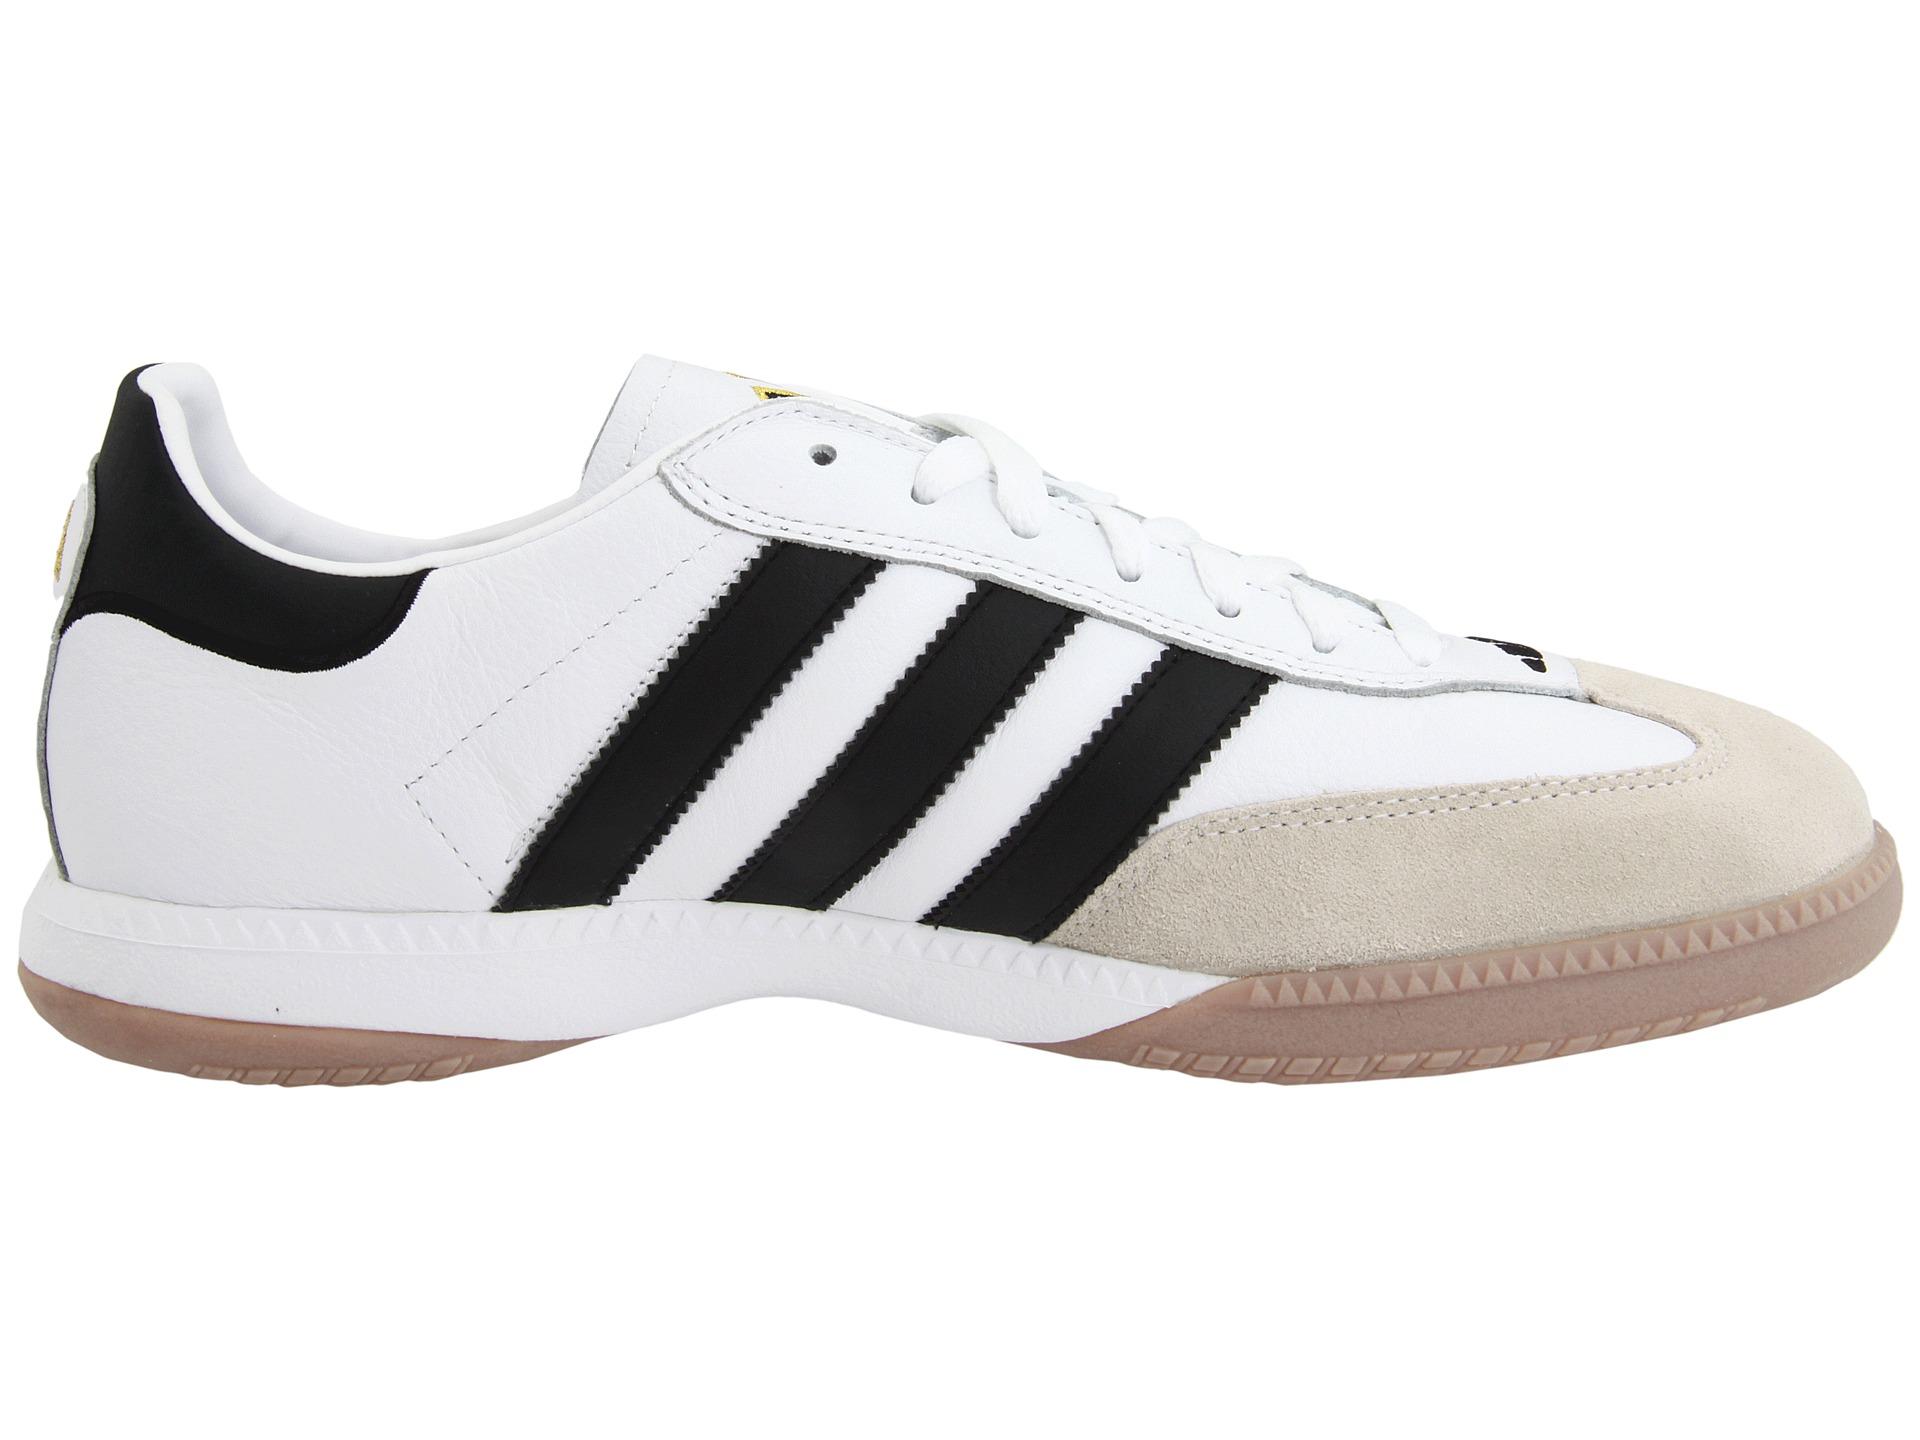 Adidas Samba Millenium Shoes